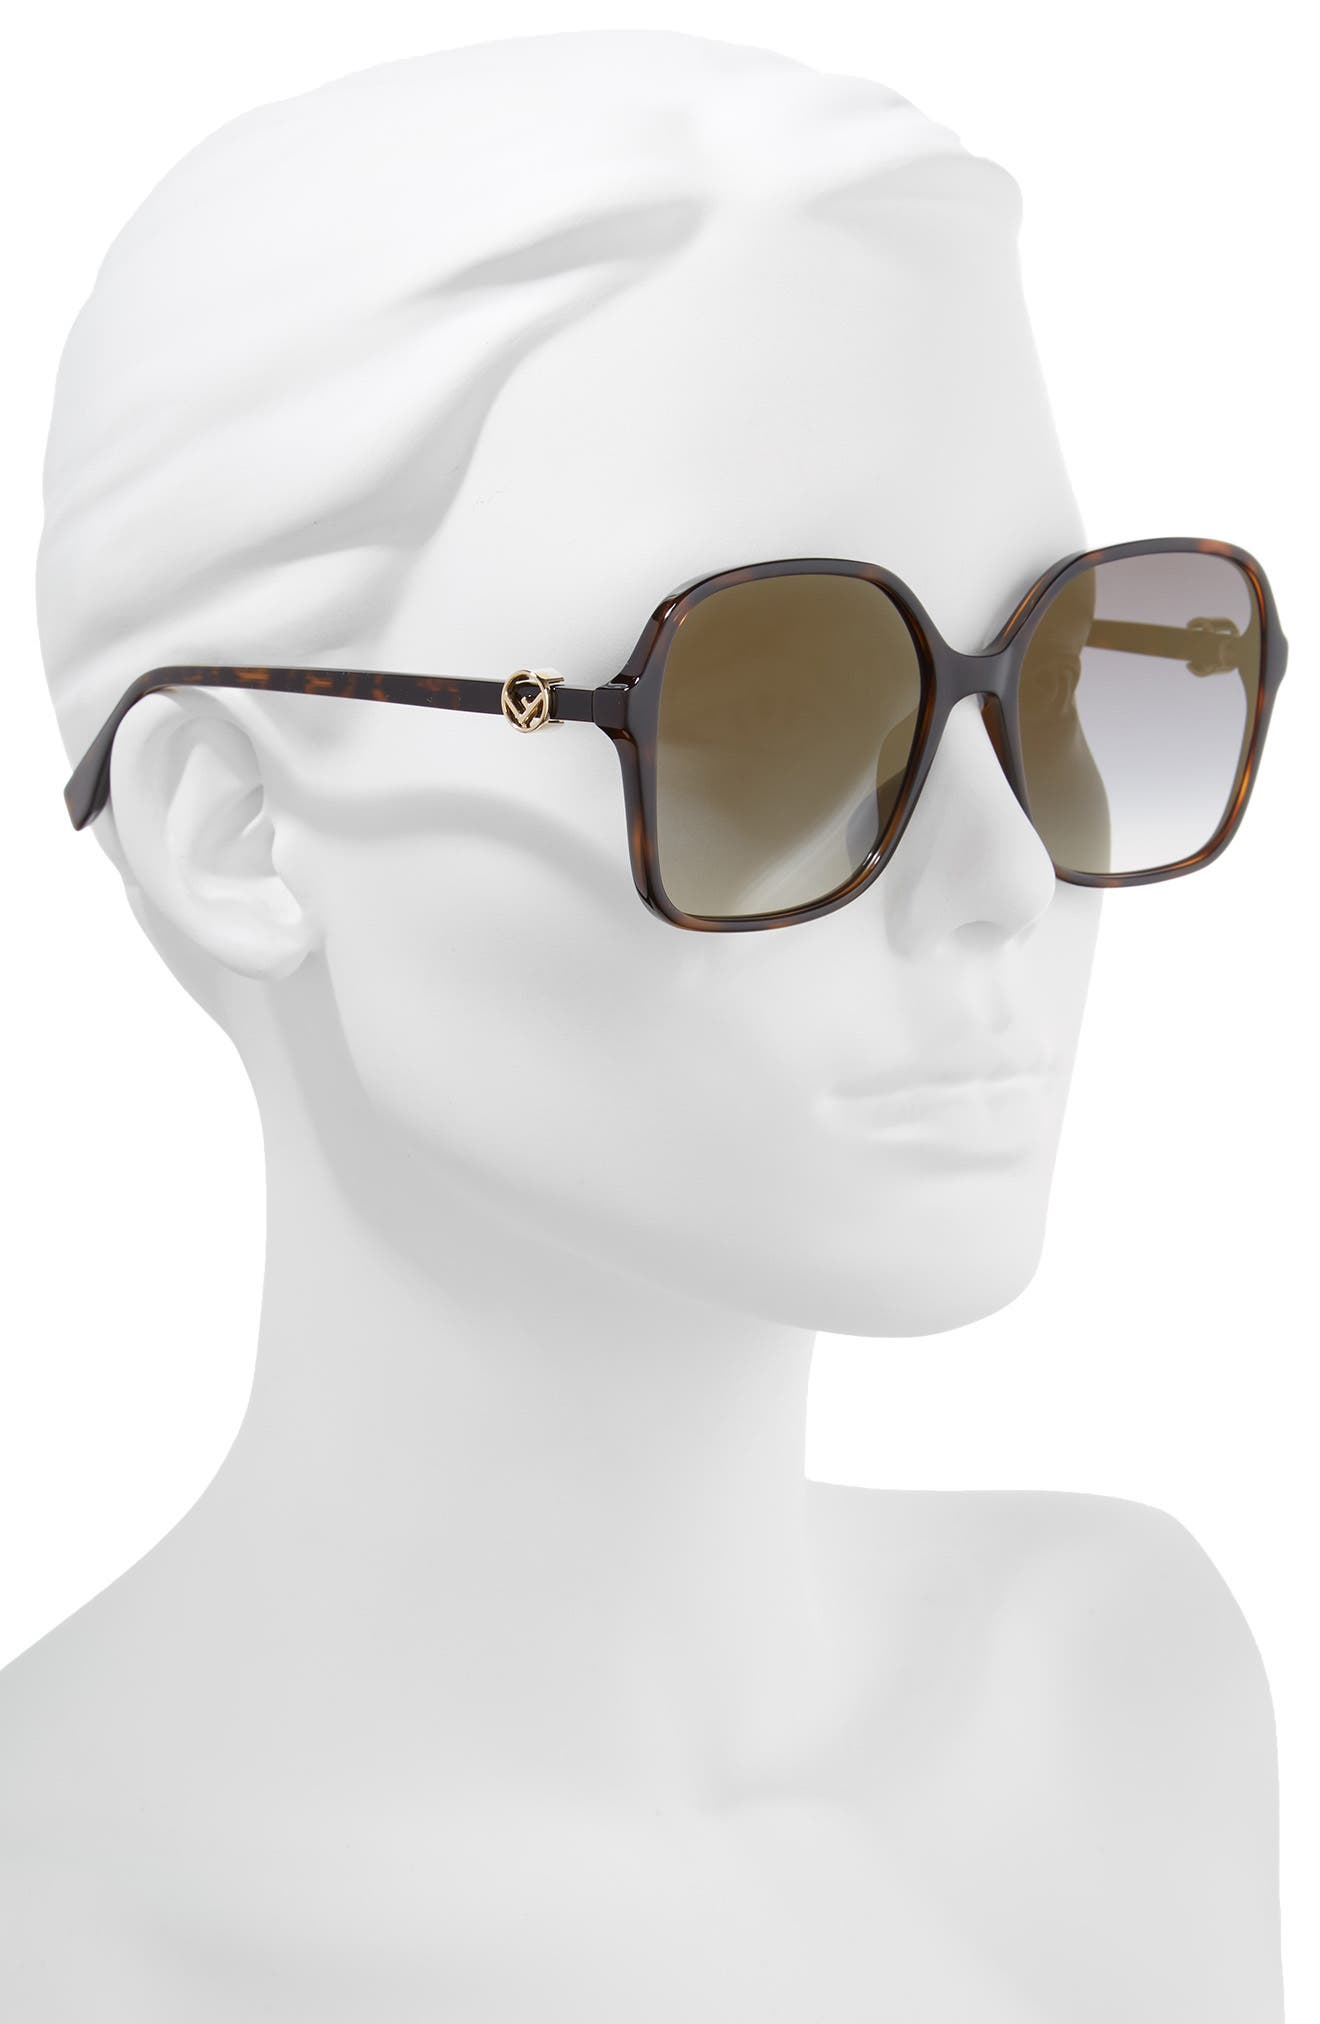 58mm Square Sunglasses,                             Alternate thumbnail 2, color,                             Dark Havana